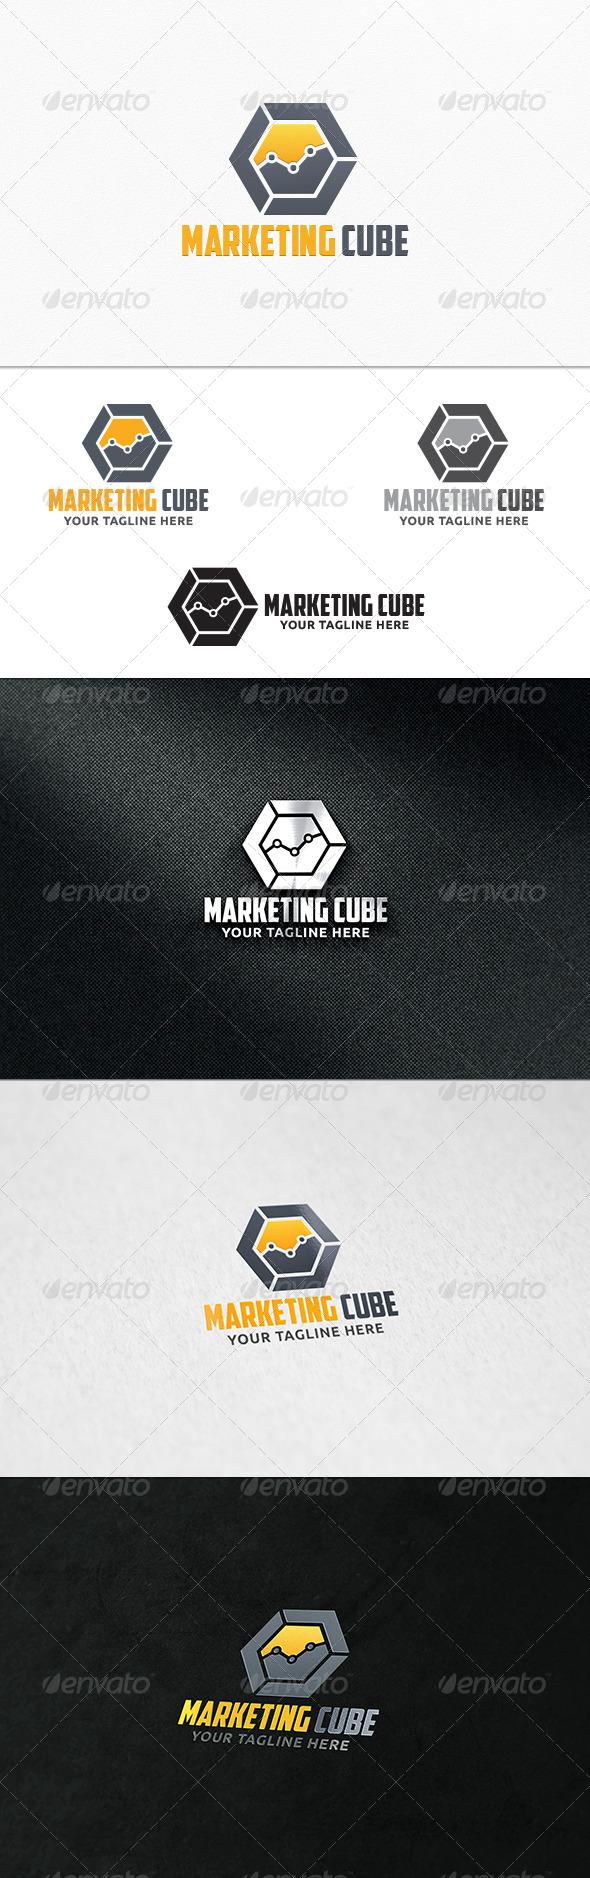 GraphicRiver Marketing Cube Logo Template 7906321